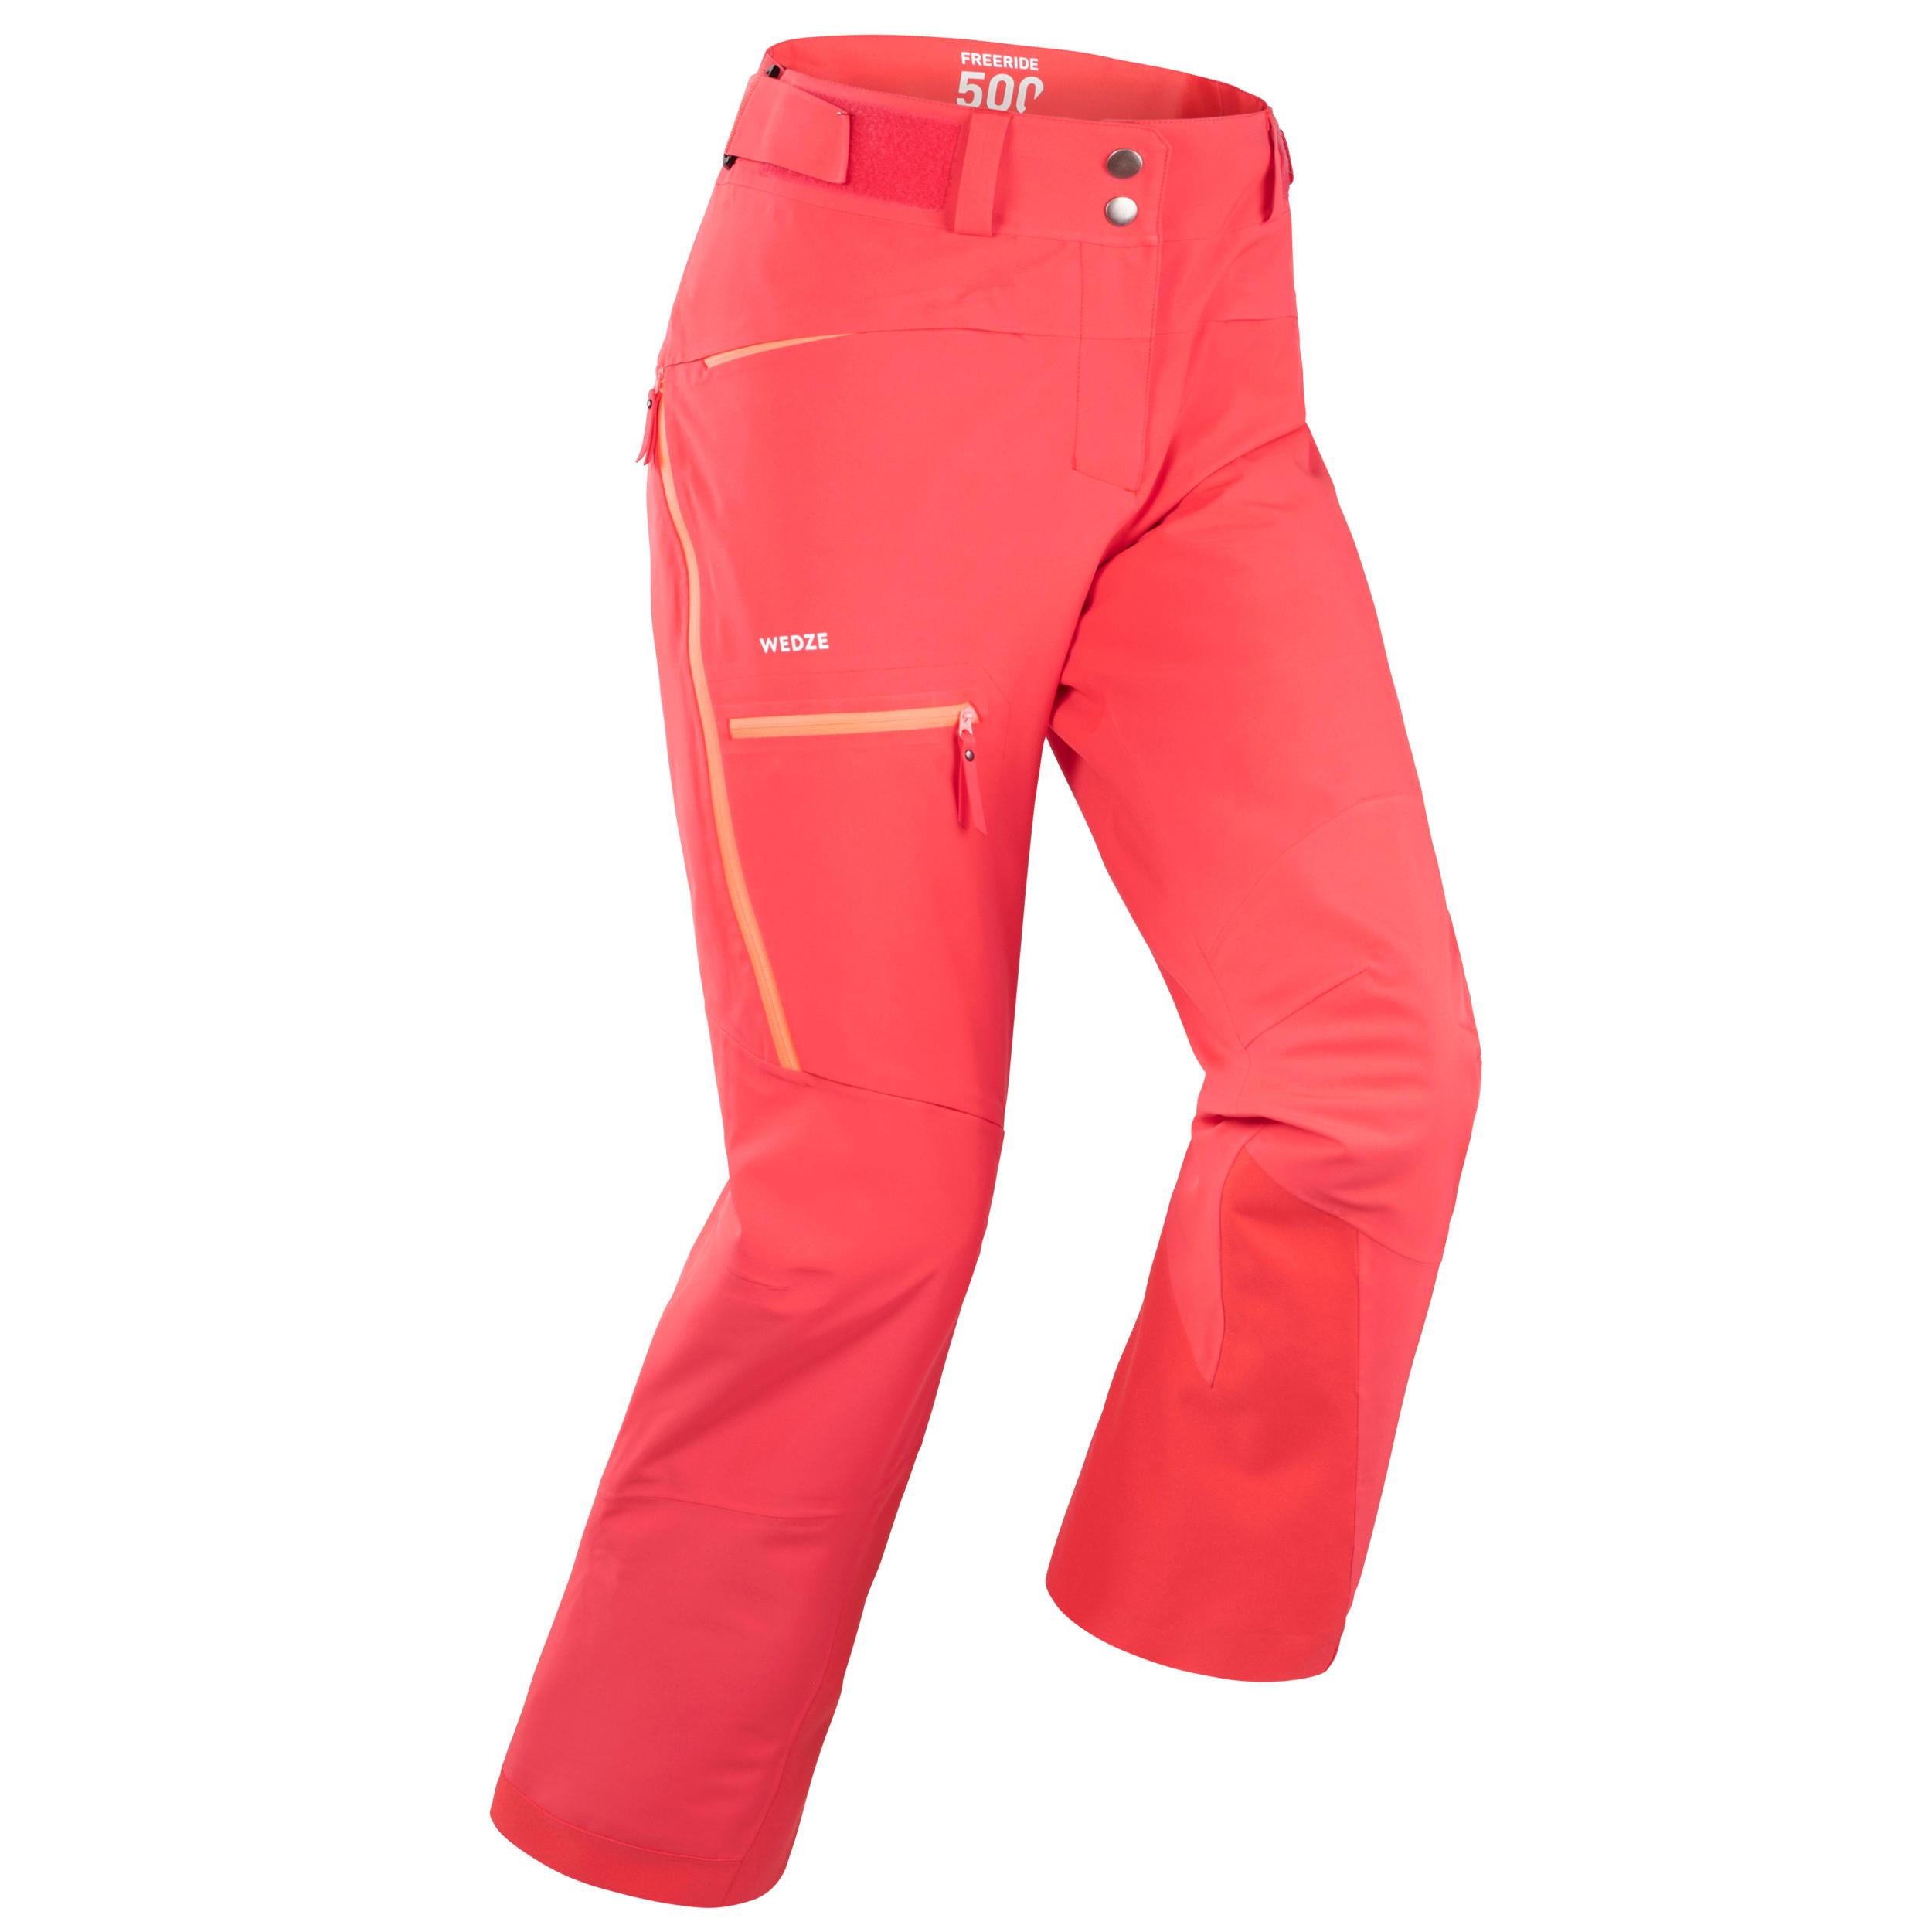 Comprar Pantalon Esqui All Mountain Wed Ze Am 900 Mujer Decathlon